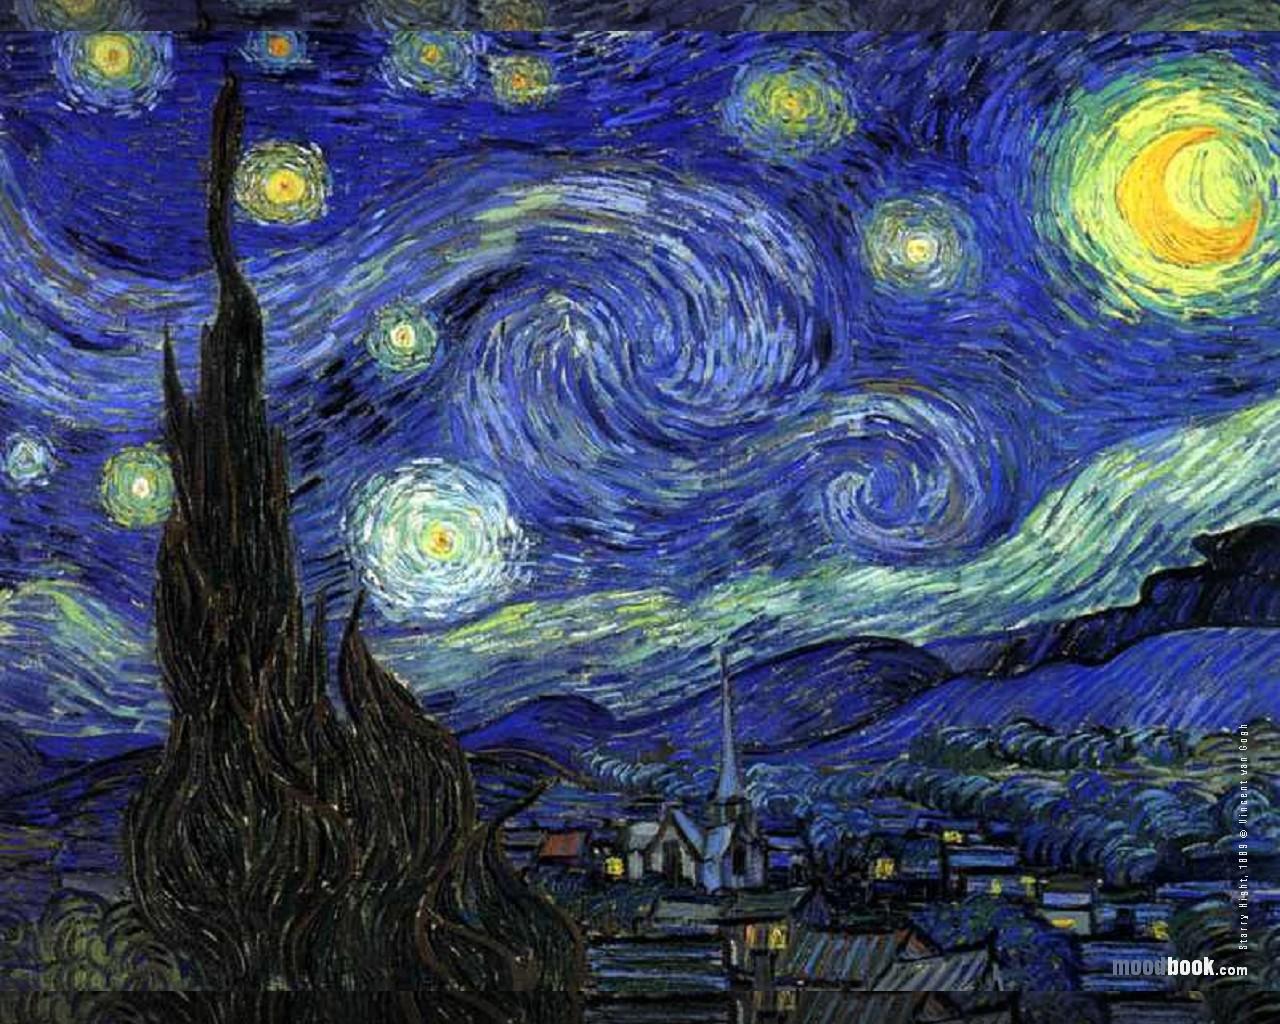 Vincent van gogh wallpaper starry night fra angelico institute for the sacred arts - Vincent van gogh wallpaper ...